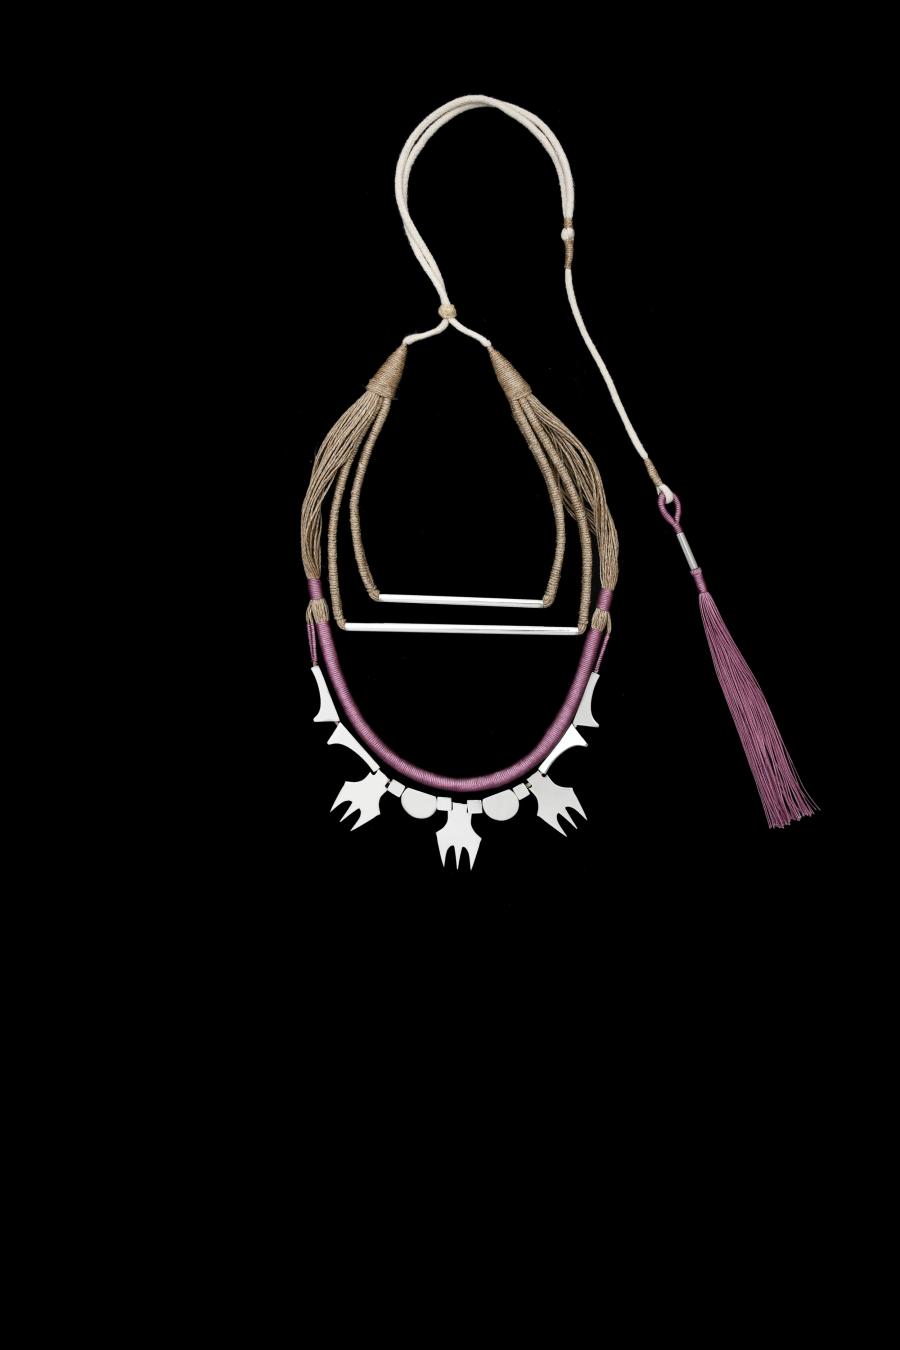 Jute geisha thread and stainless steel